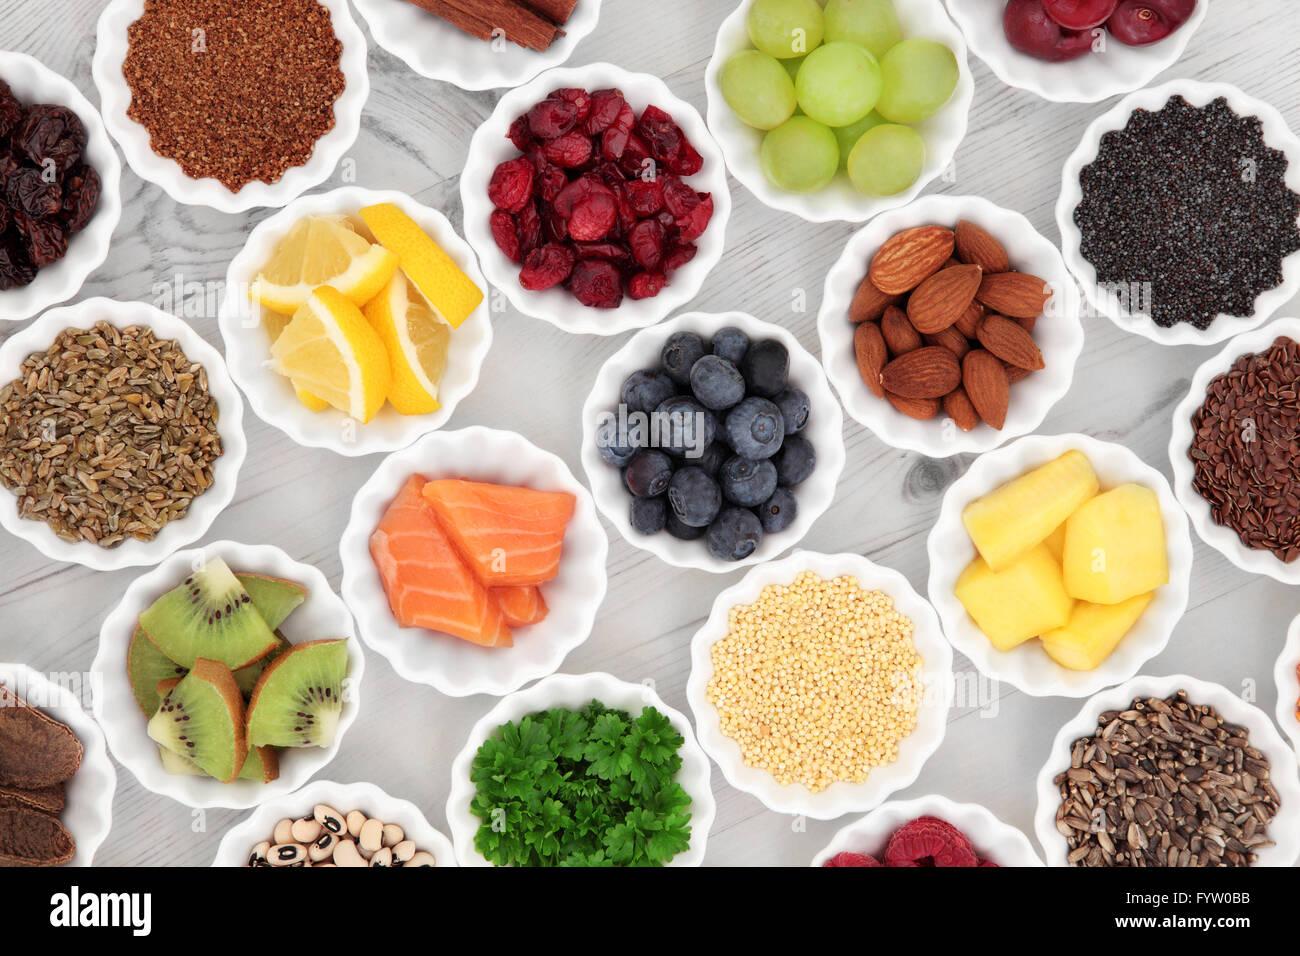 Super food selection in porcelain crinkle bowls over distressed wooden background. - Stock Image